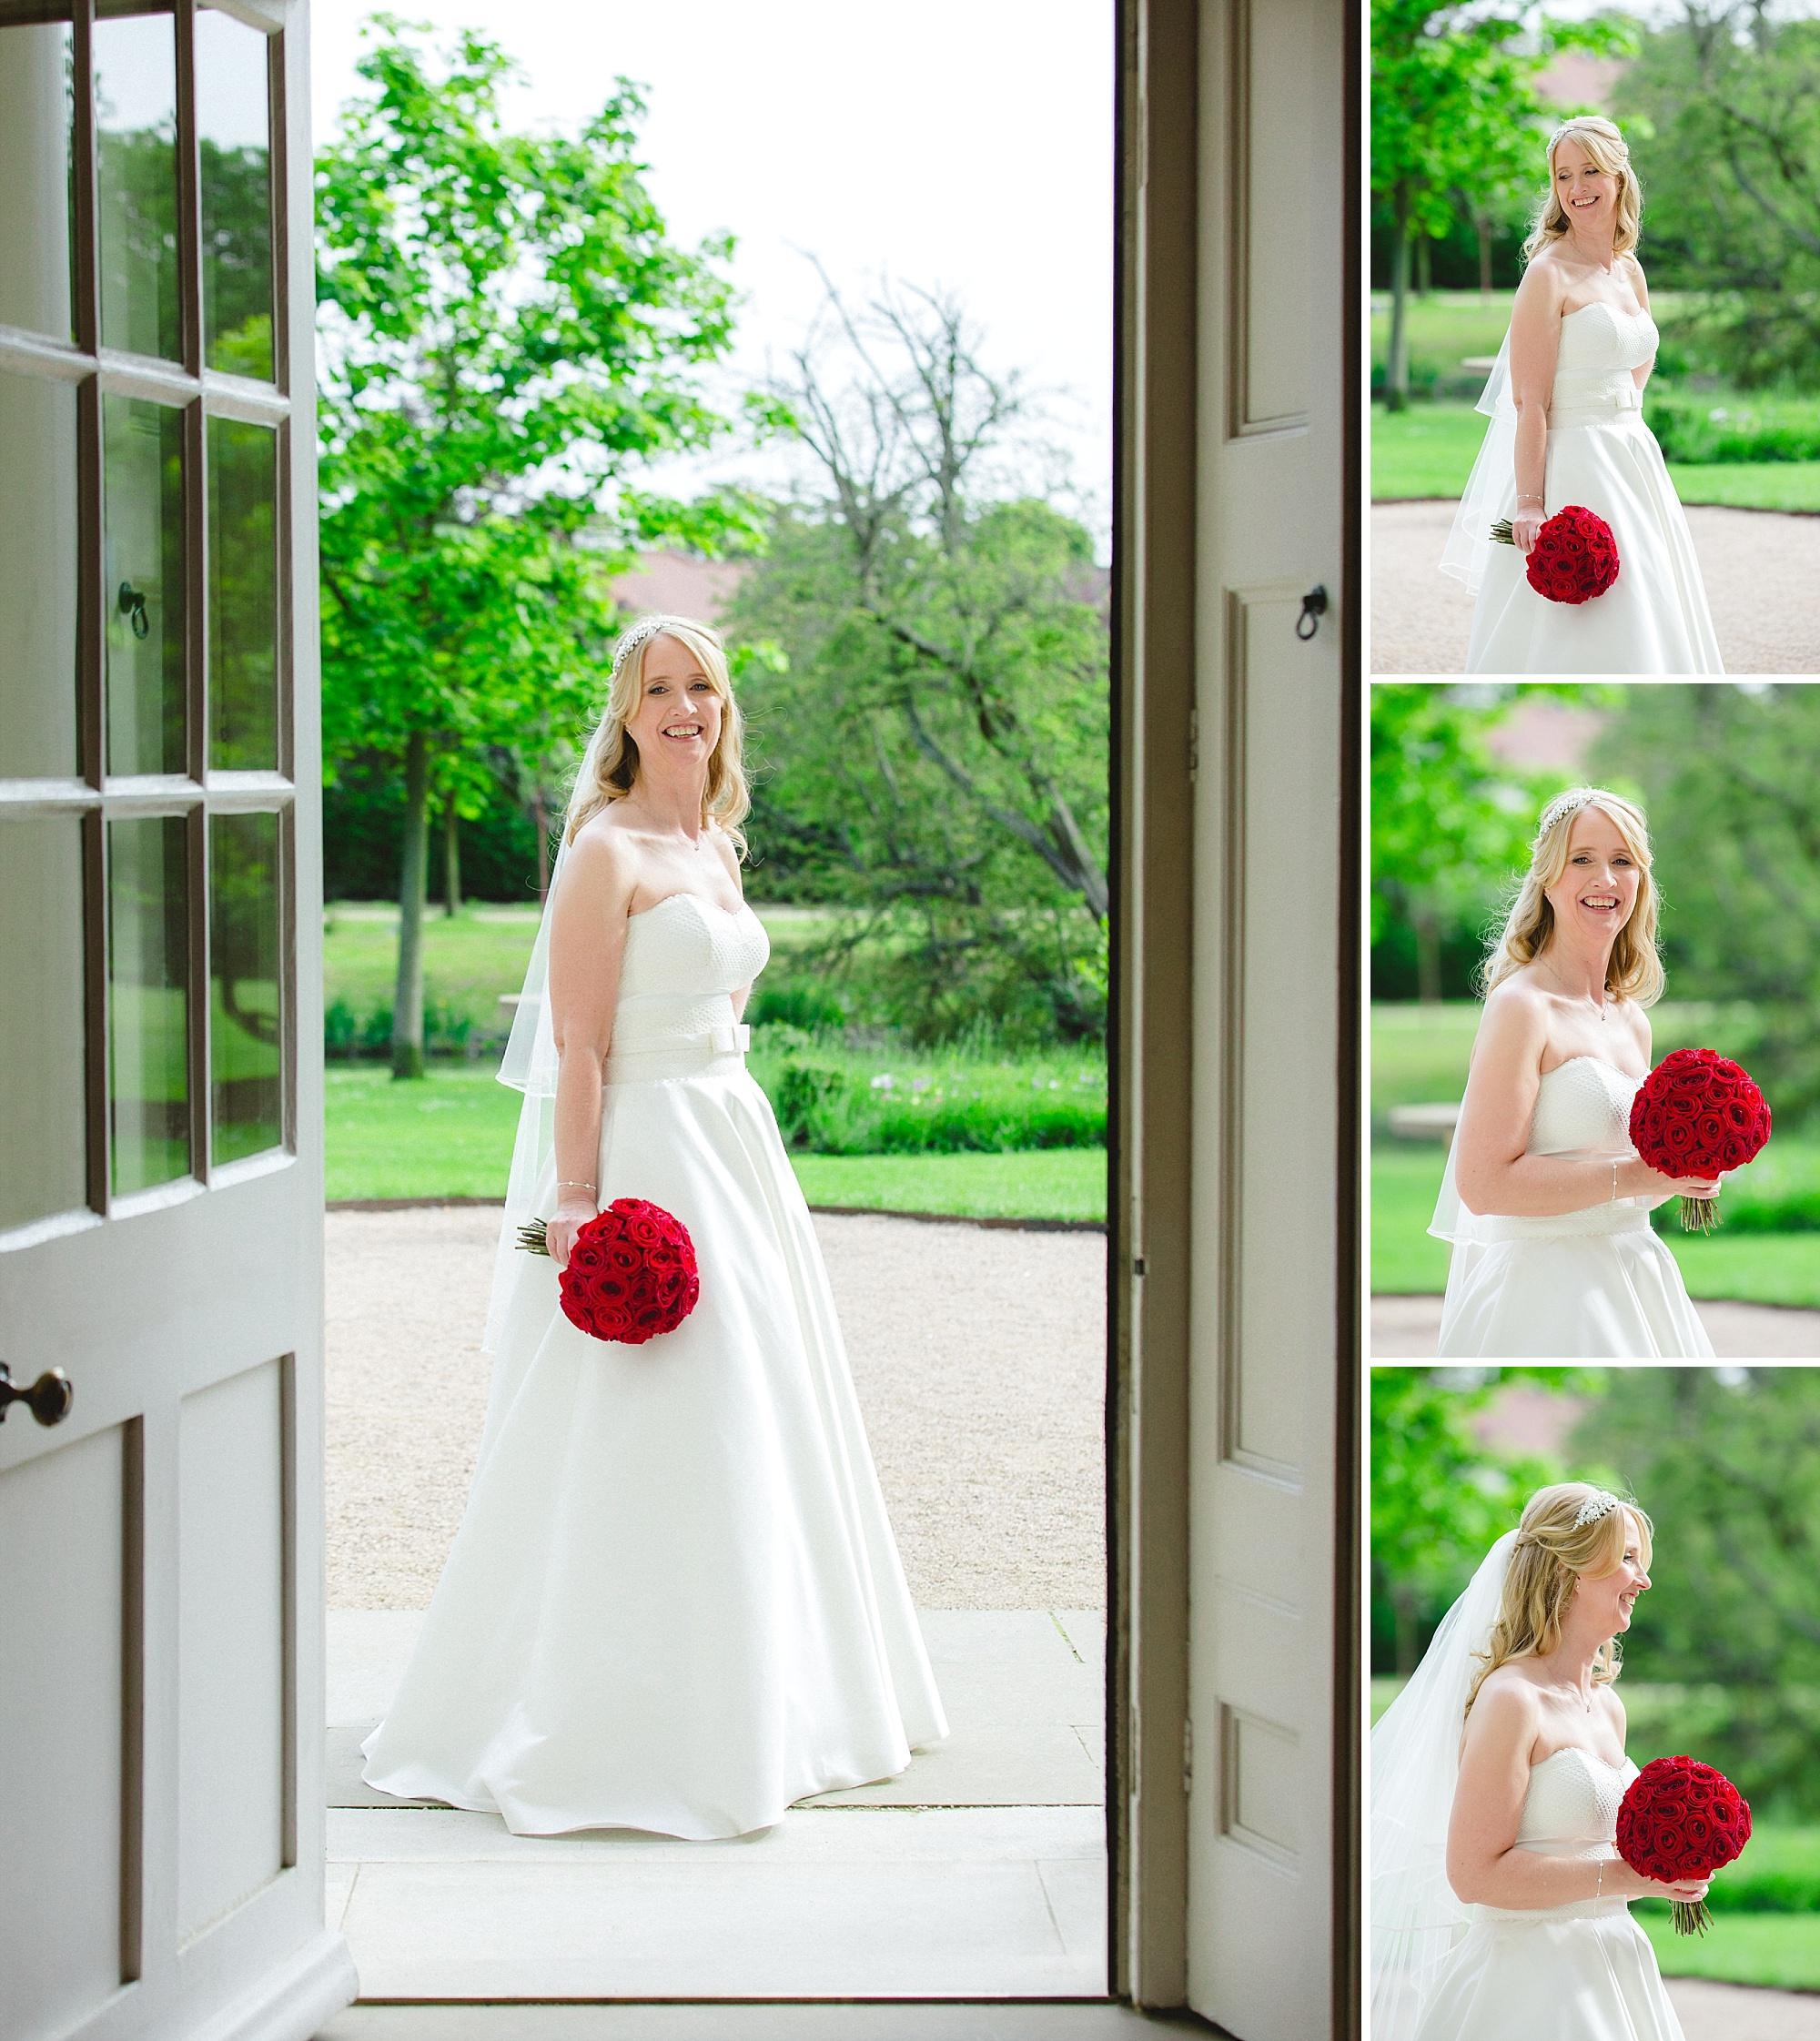 Langtons-Essex-Mod-Themed-Wedding_0046.jpg